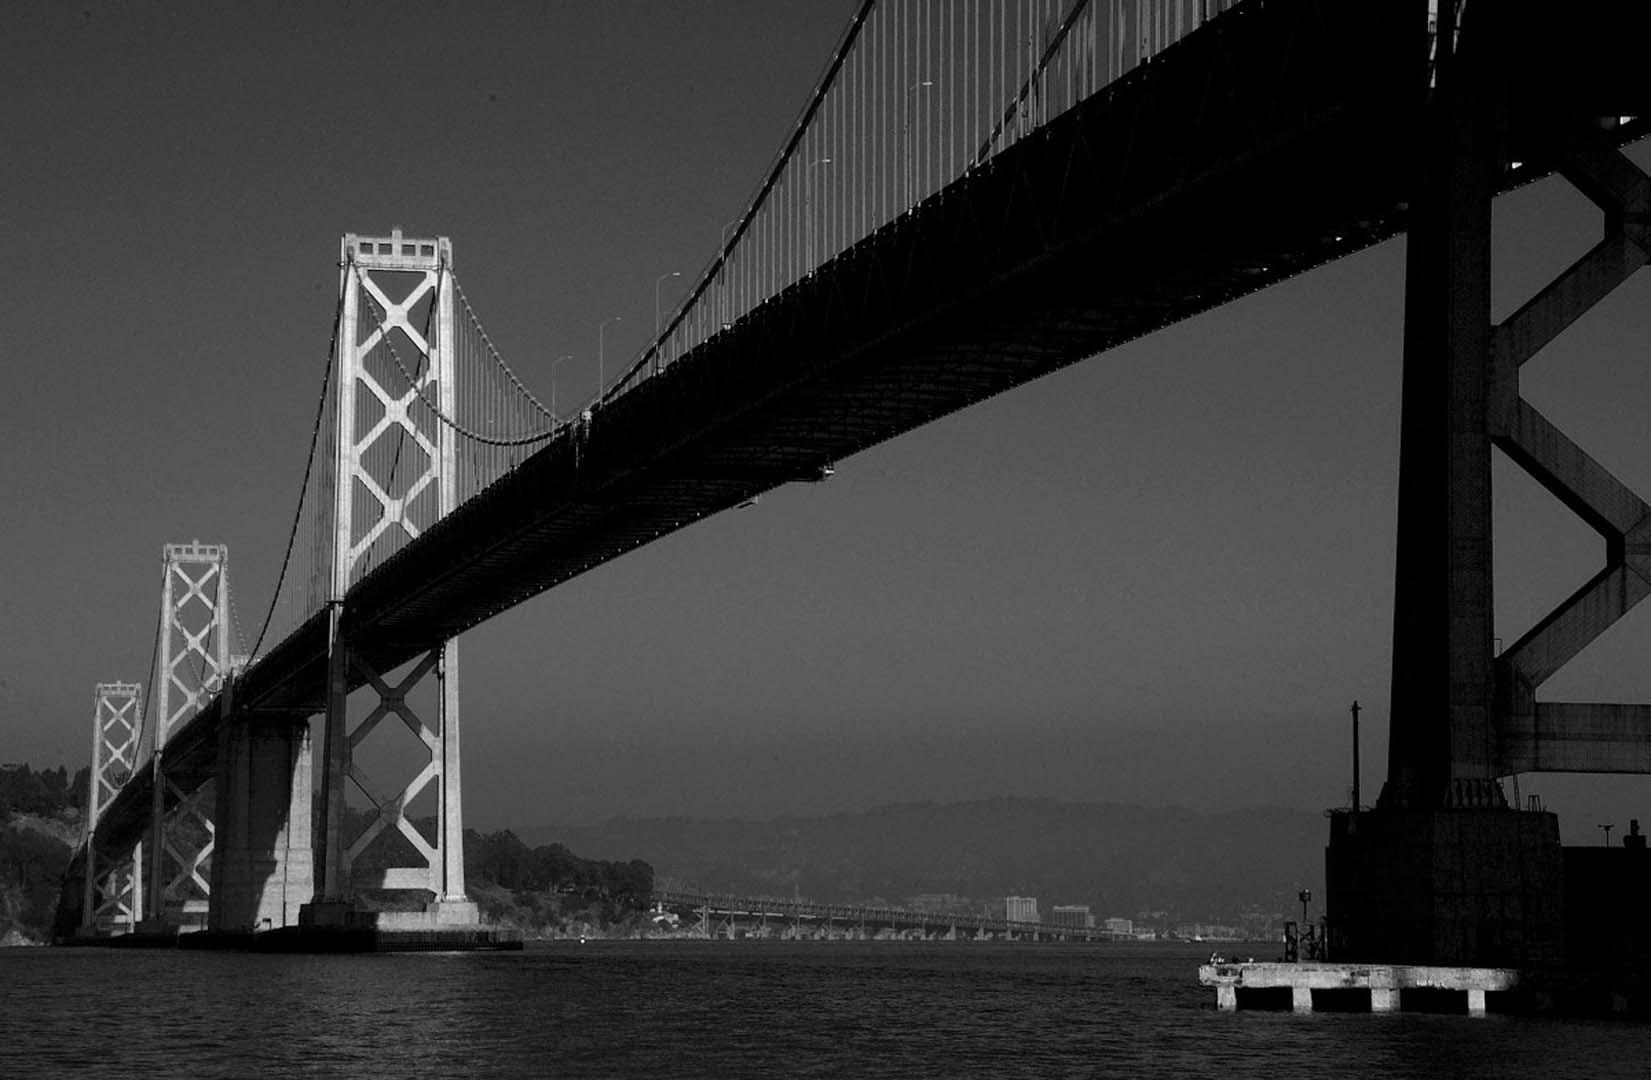 BAY BRIDGE BW